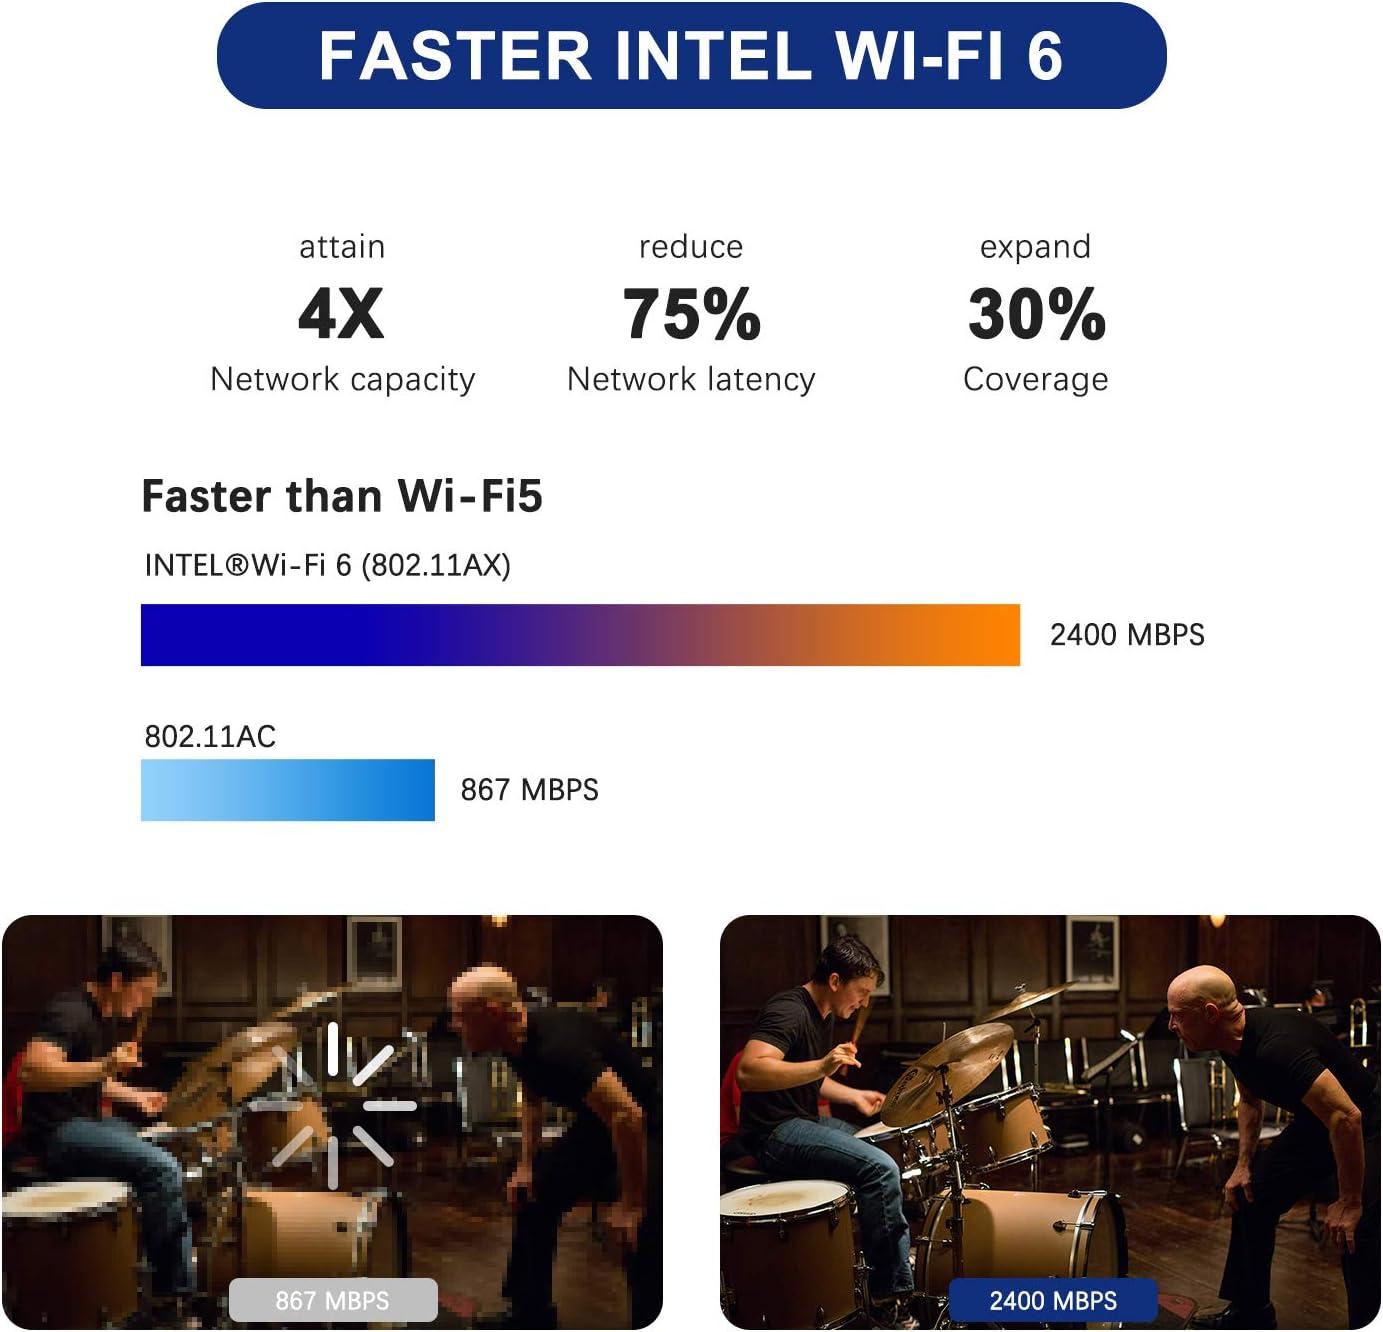 8 GB DDR4 256GB SATA SSD Radeon Vega 6 Graphics Mini Desktop Computer Support Intel/®Wi-Fi 6//Triple Output 4K@60 Hz//BT5.1 AMD Ryzen 3 3300U 4 Cores//4 Threads Processeur UM300 Windows 10 Mini PC